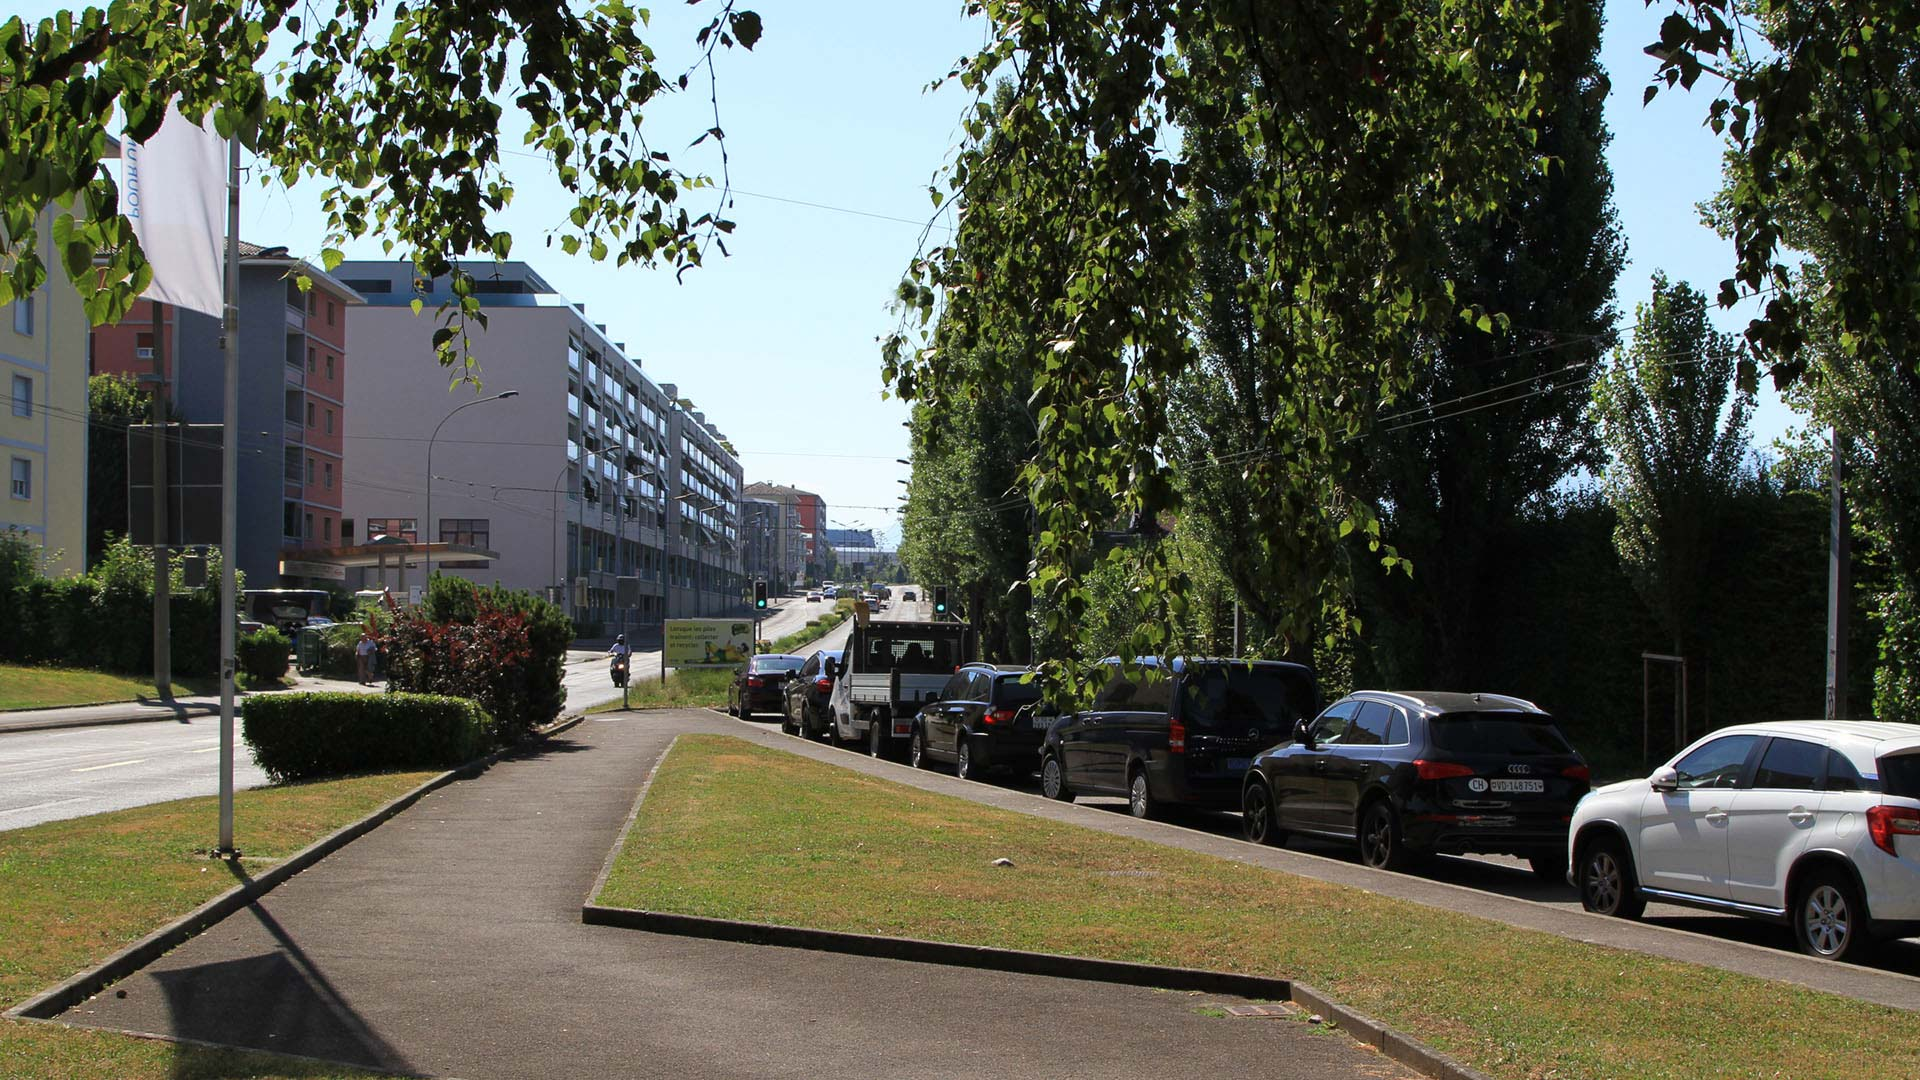 Hotel de ville sol